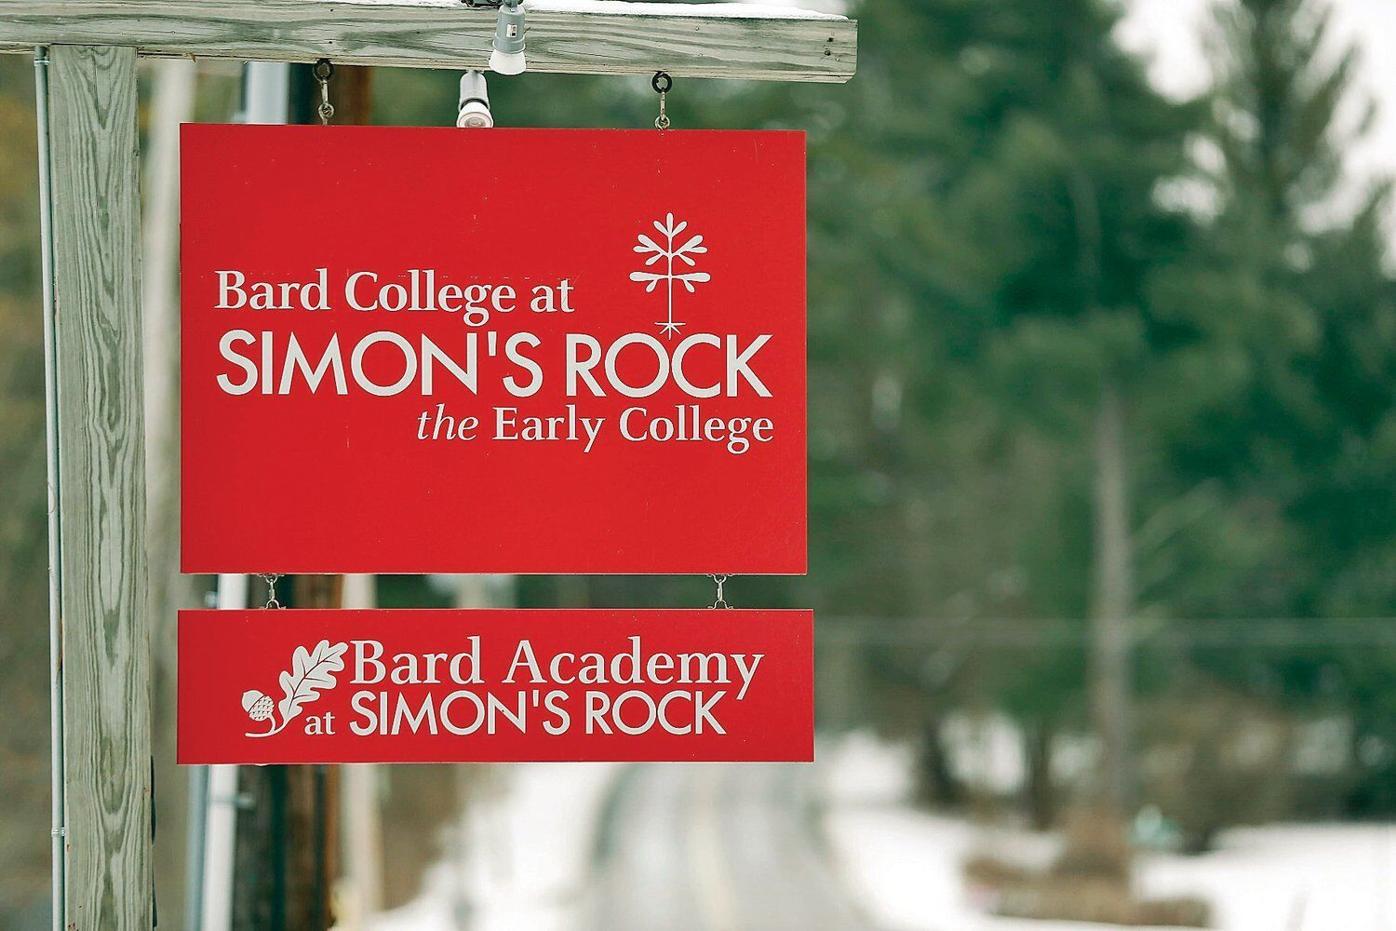 DA drops investigation into alleged assault at Bard College at Simon's Rock